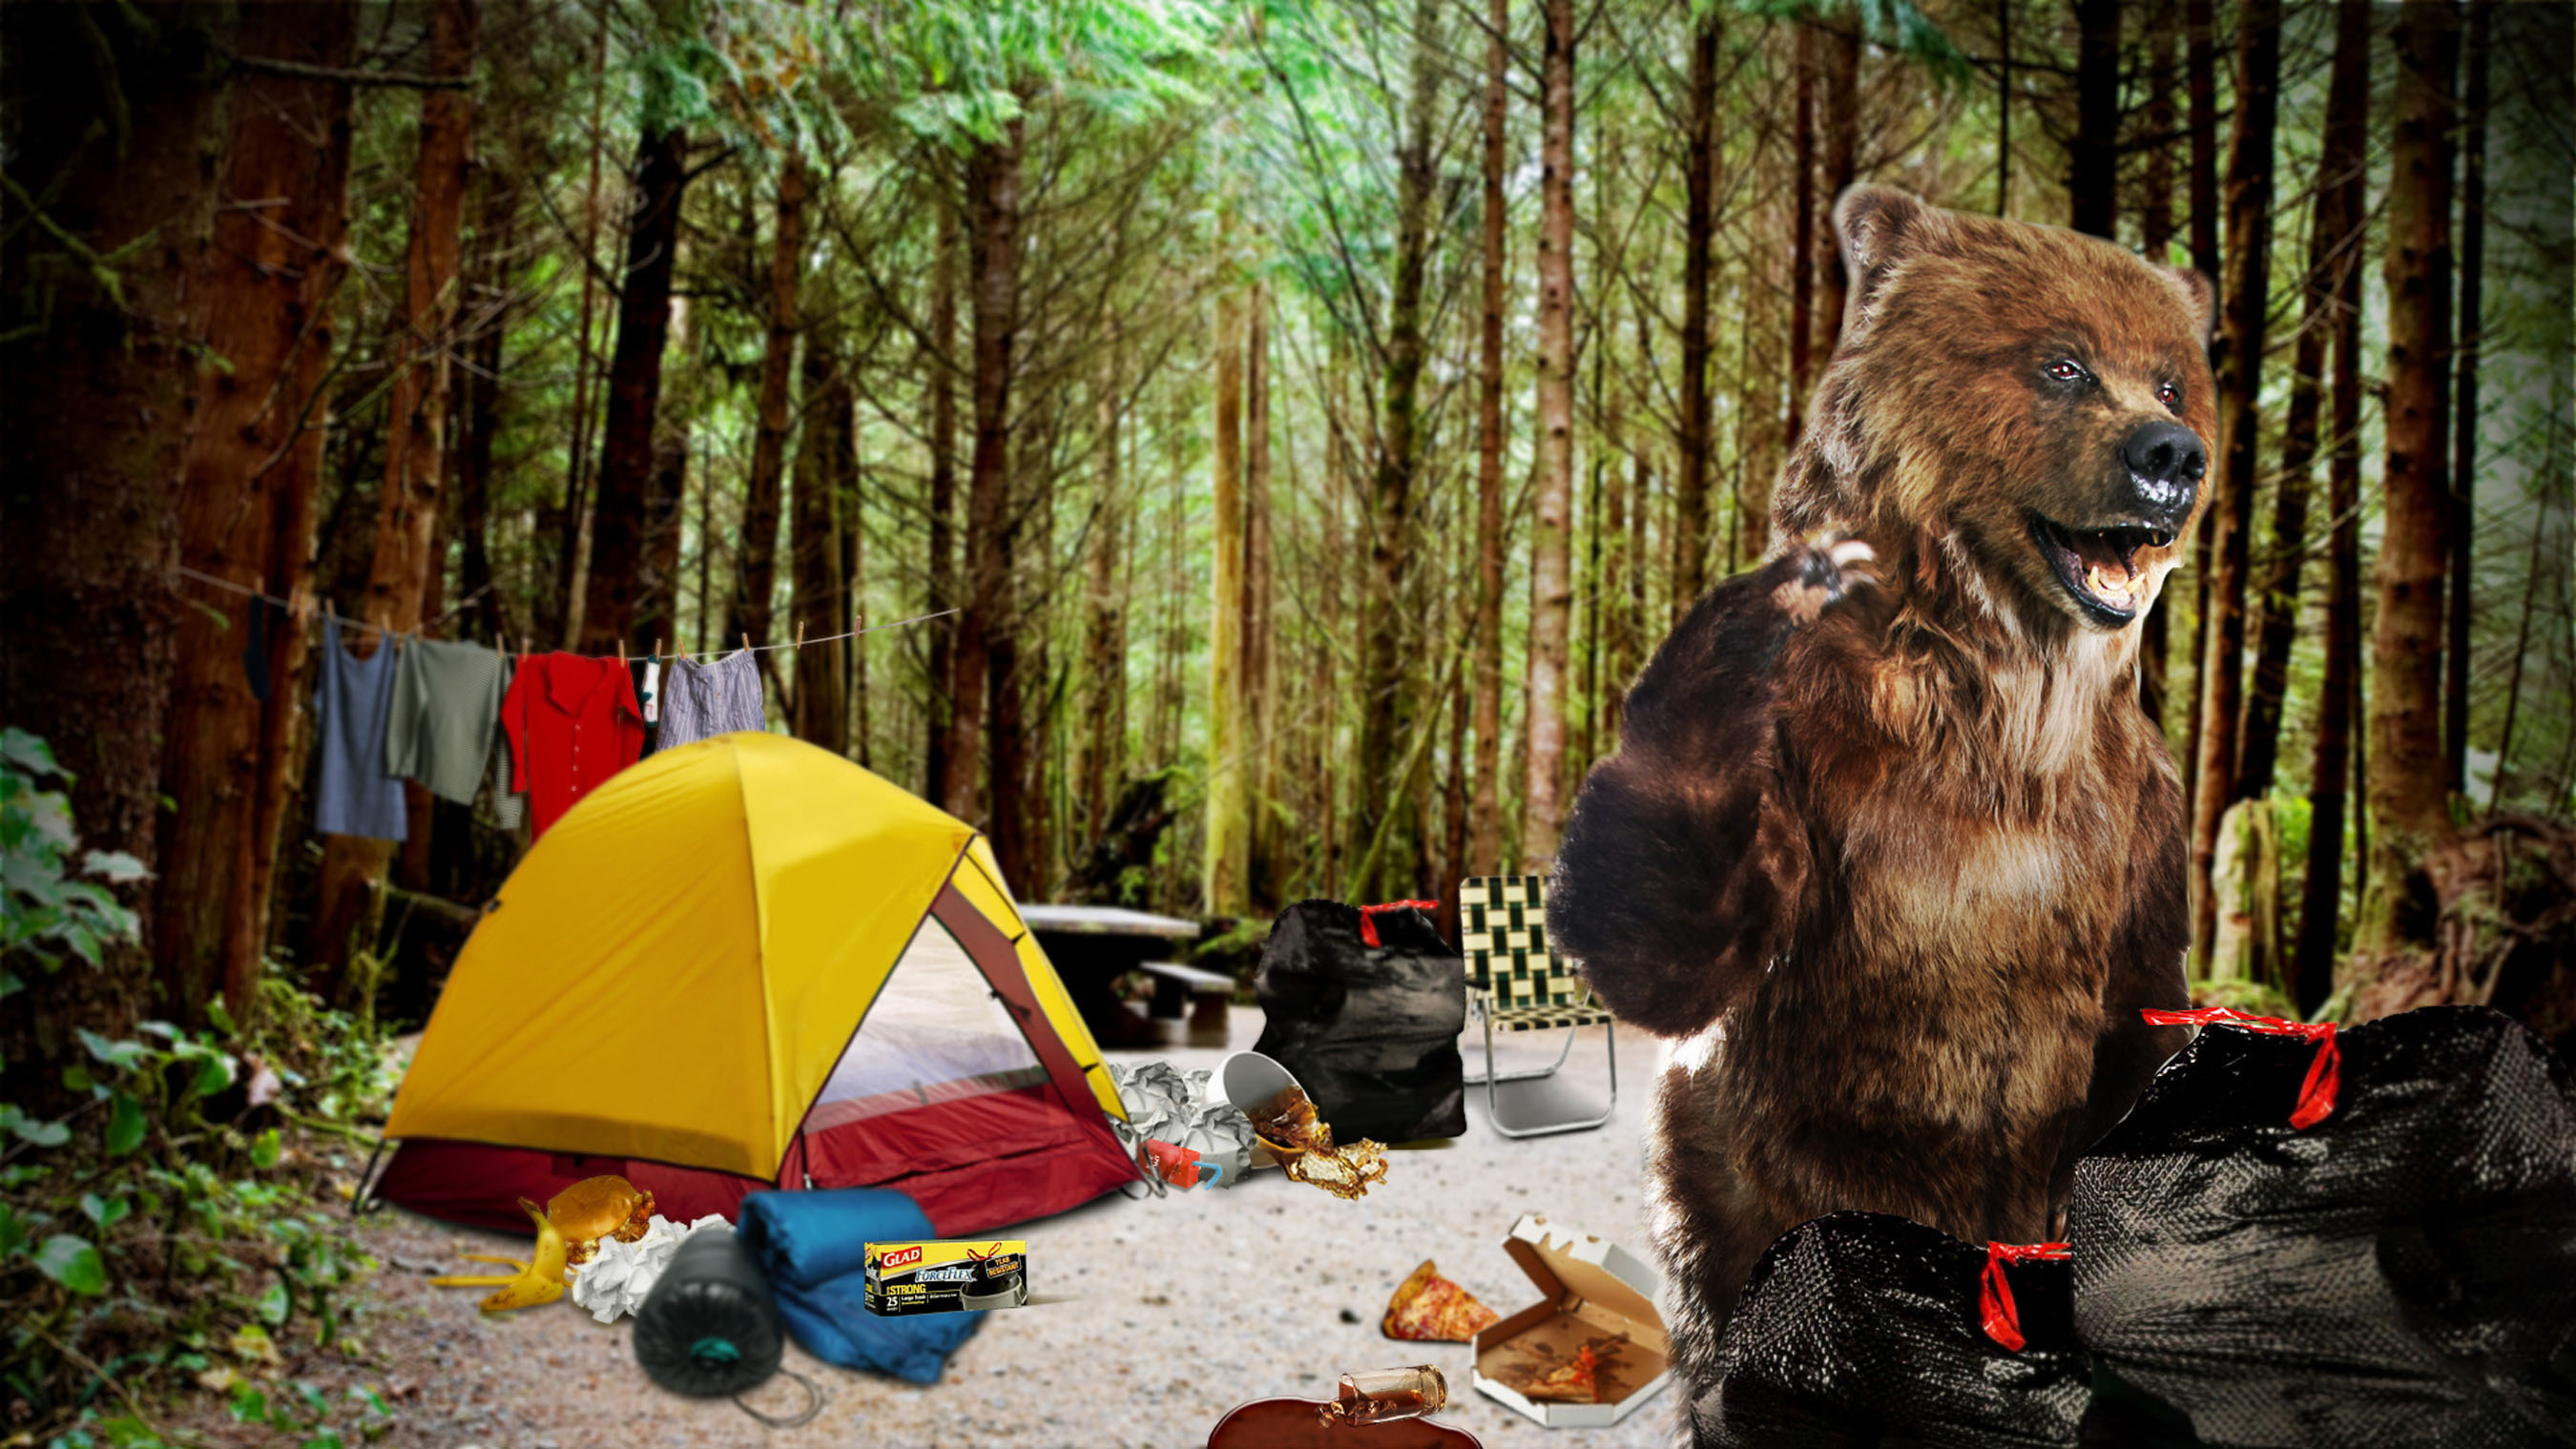 The Wild Life.  (PRNewsFoto/The GLAD Products Company)